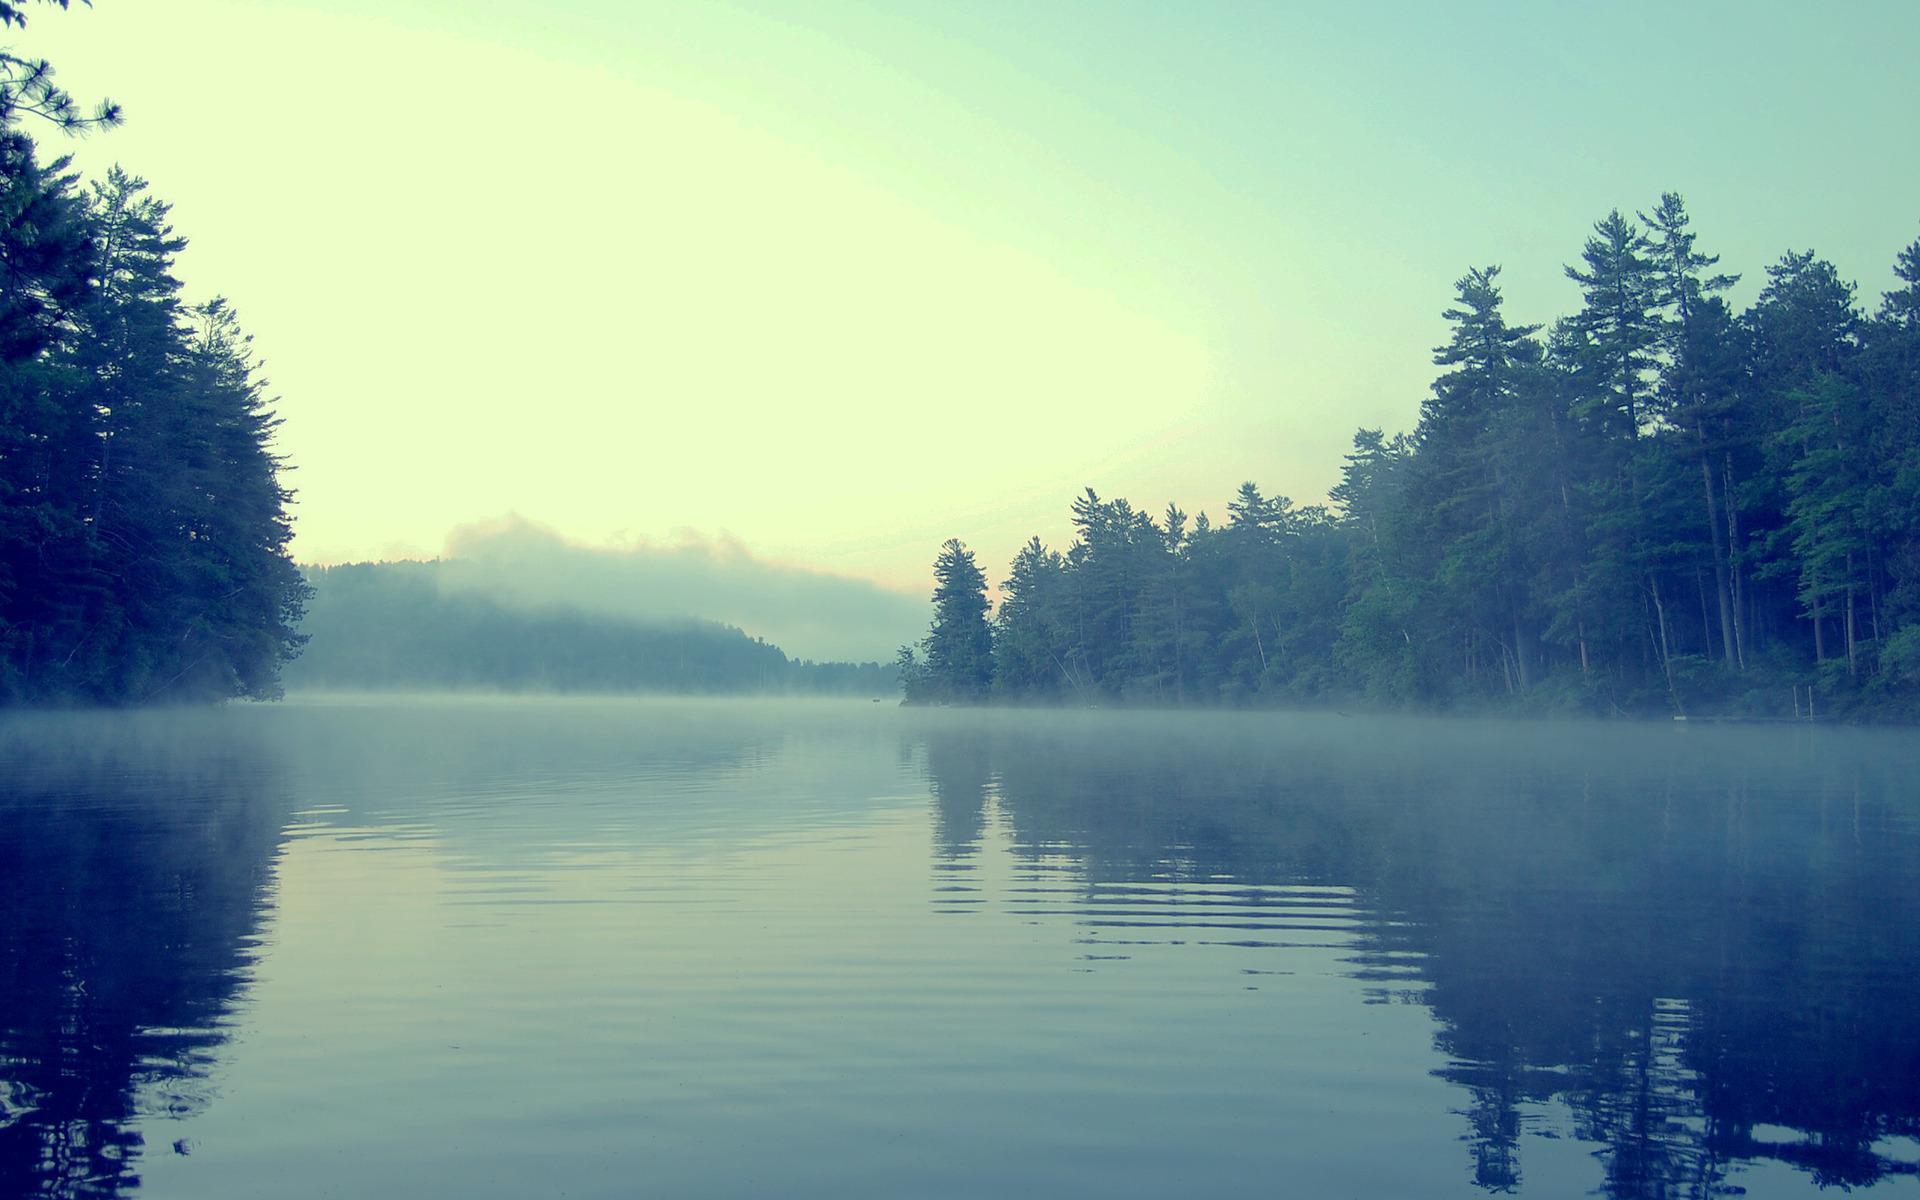 озеро туман обои на рабочий стол № 381708 бесплатно